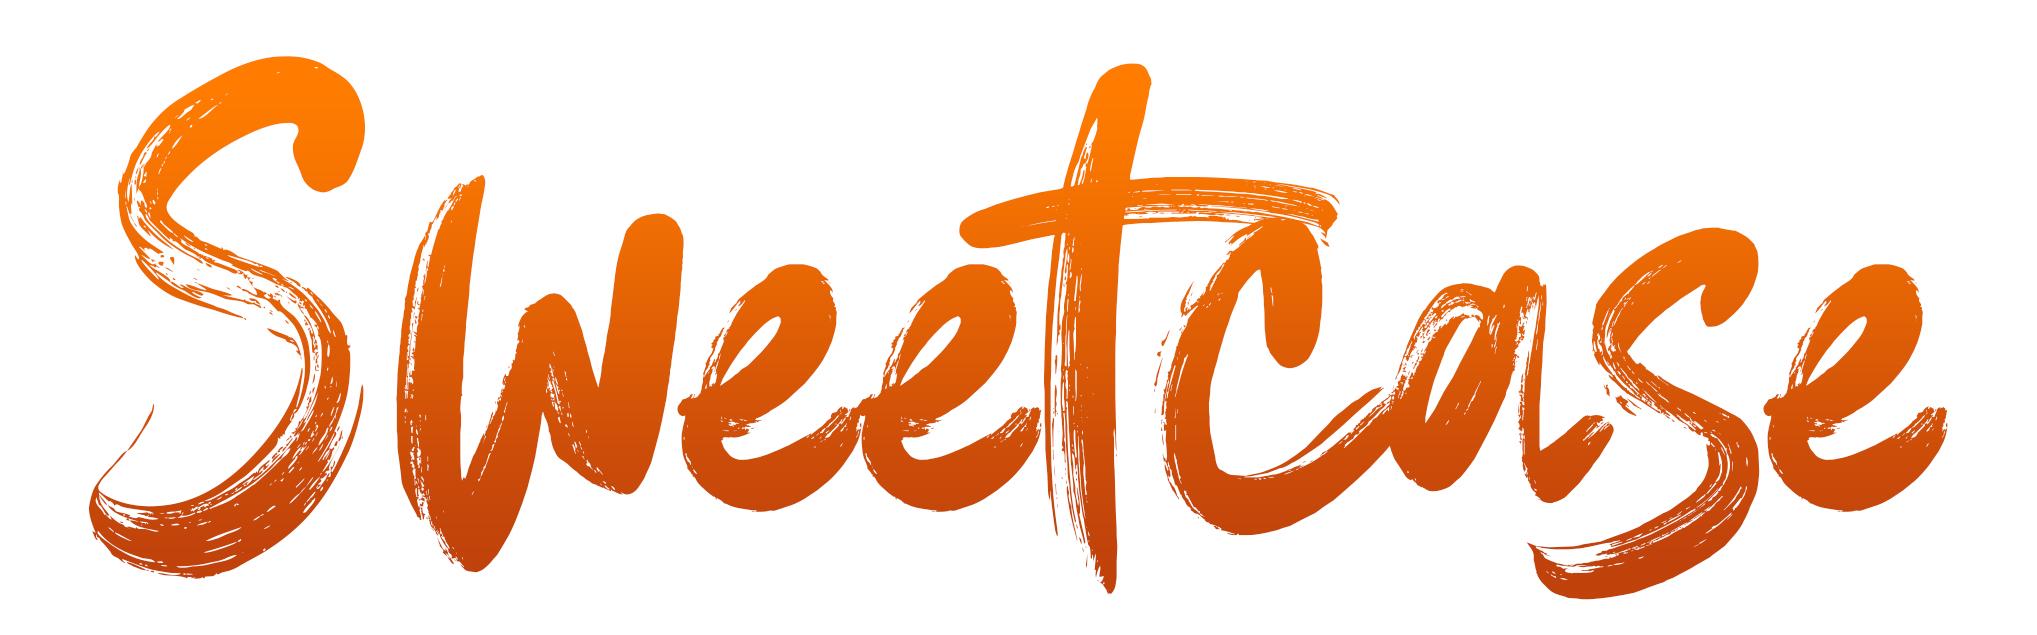 Sweetcase - Capas para Mala